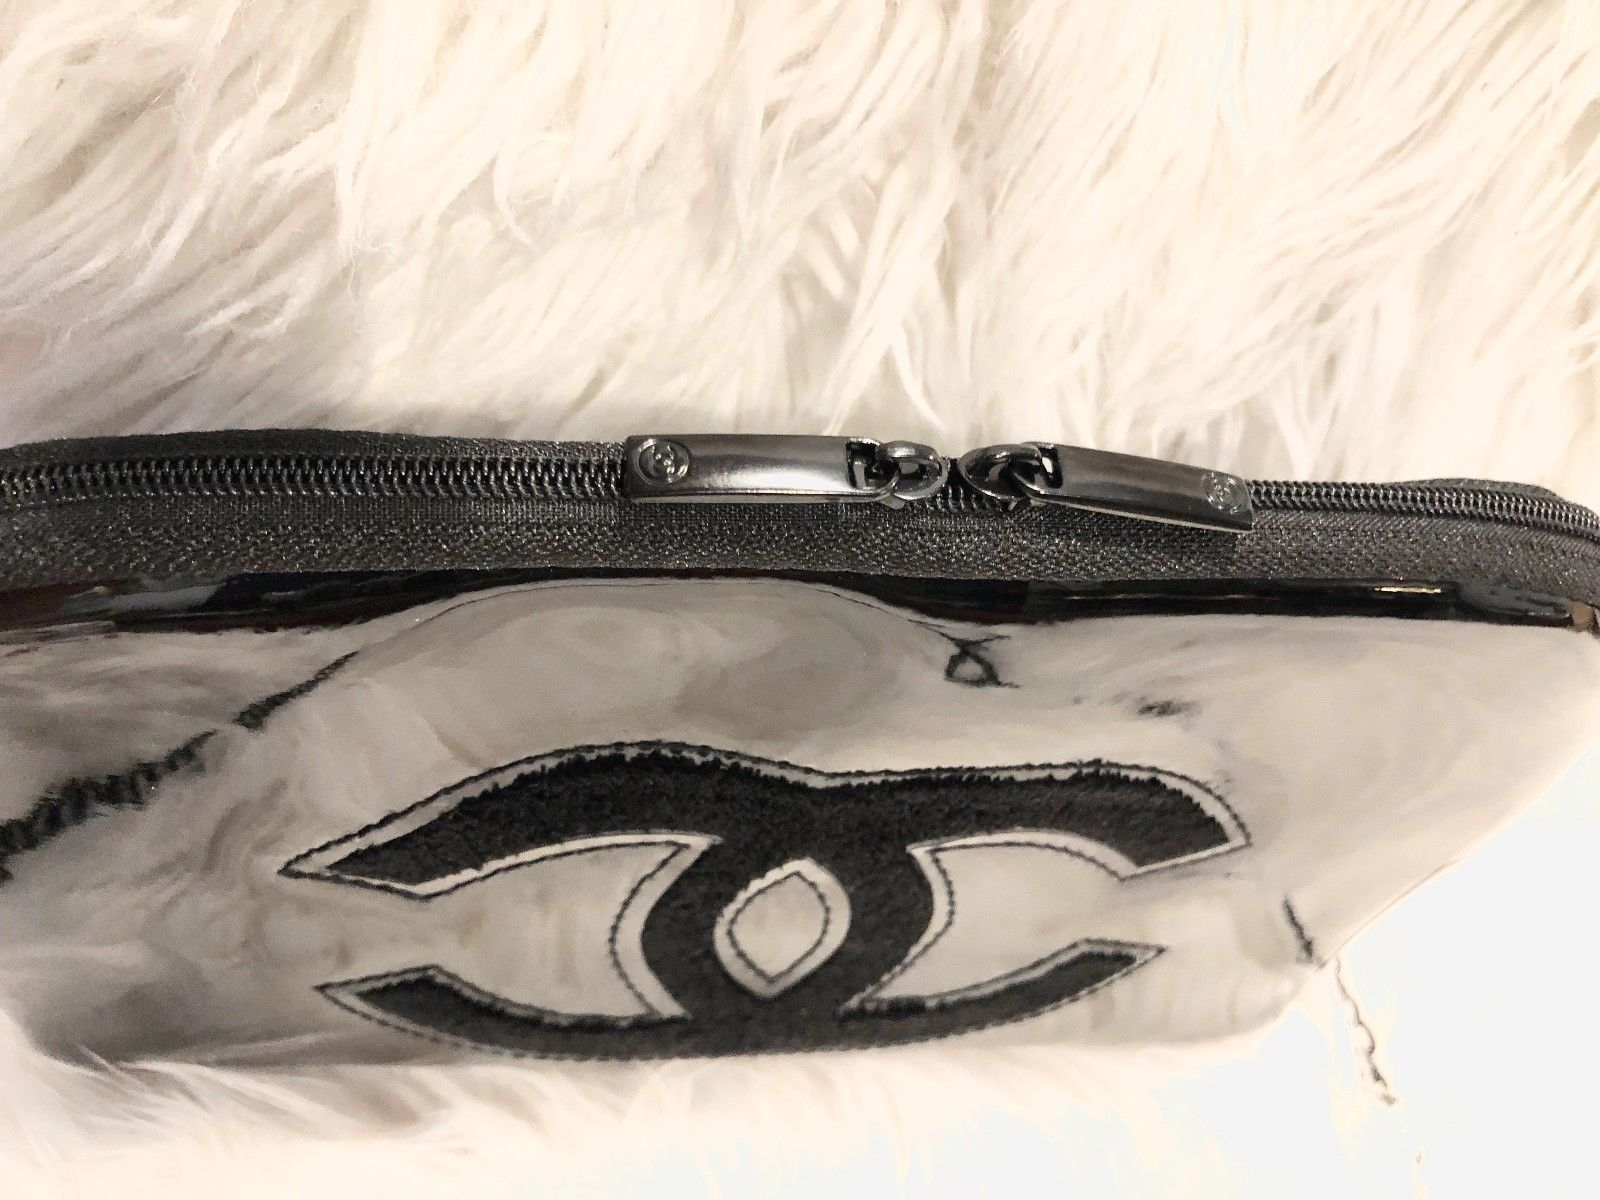 43c1d305d0d54c Chanel Make up Bag w/ a Crossbody Metal Chain Black Patent VIP Gift